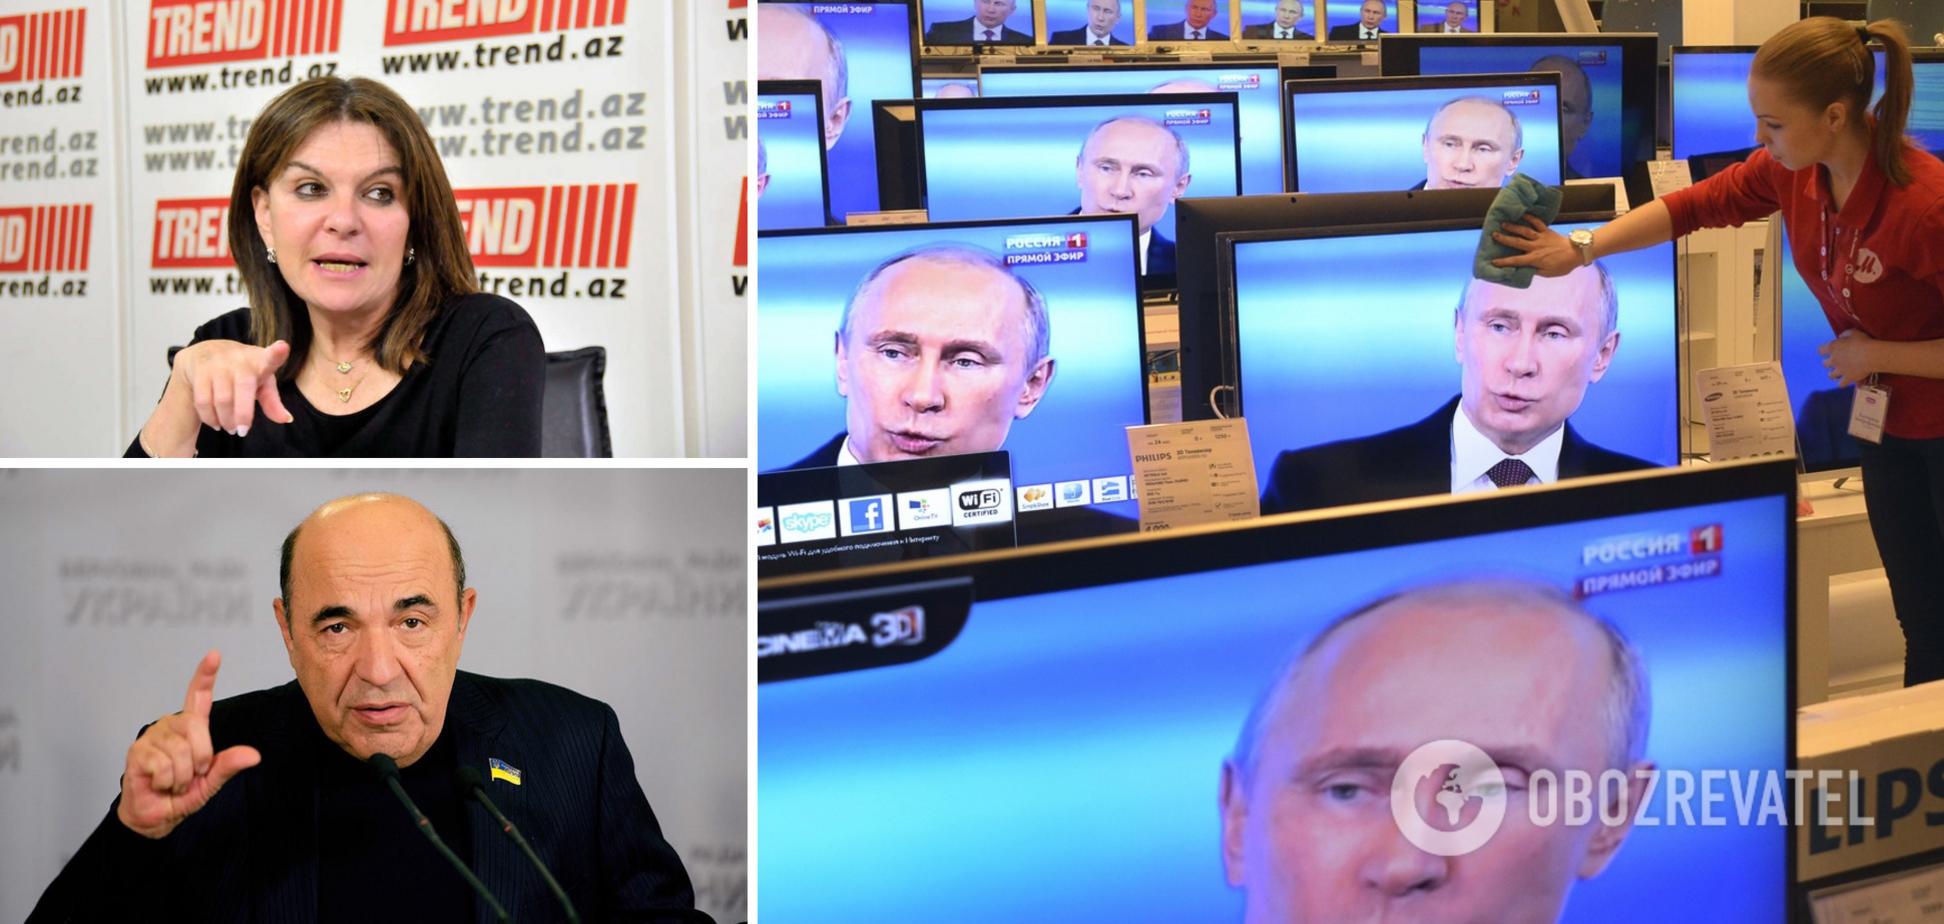 Сенаторов из Франции заметили в пропаганде РФ против Украины: названо имя причастного нардепа